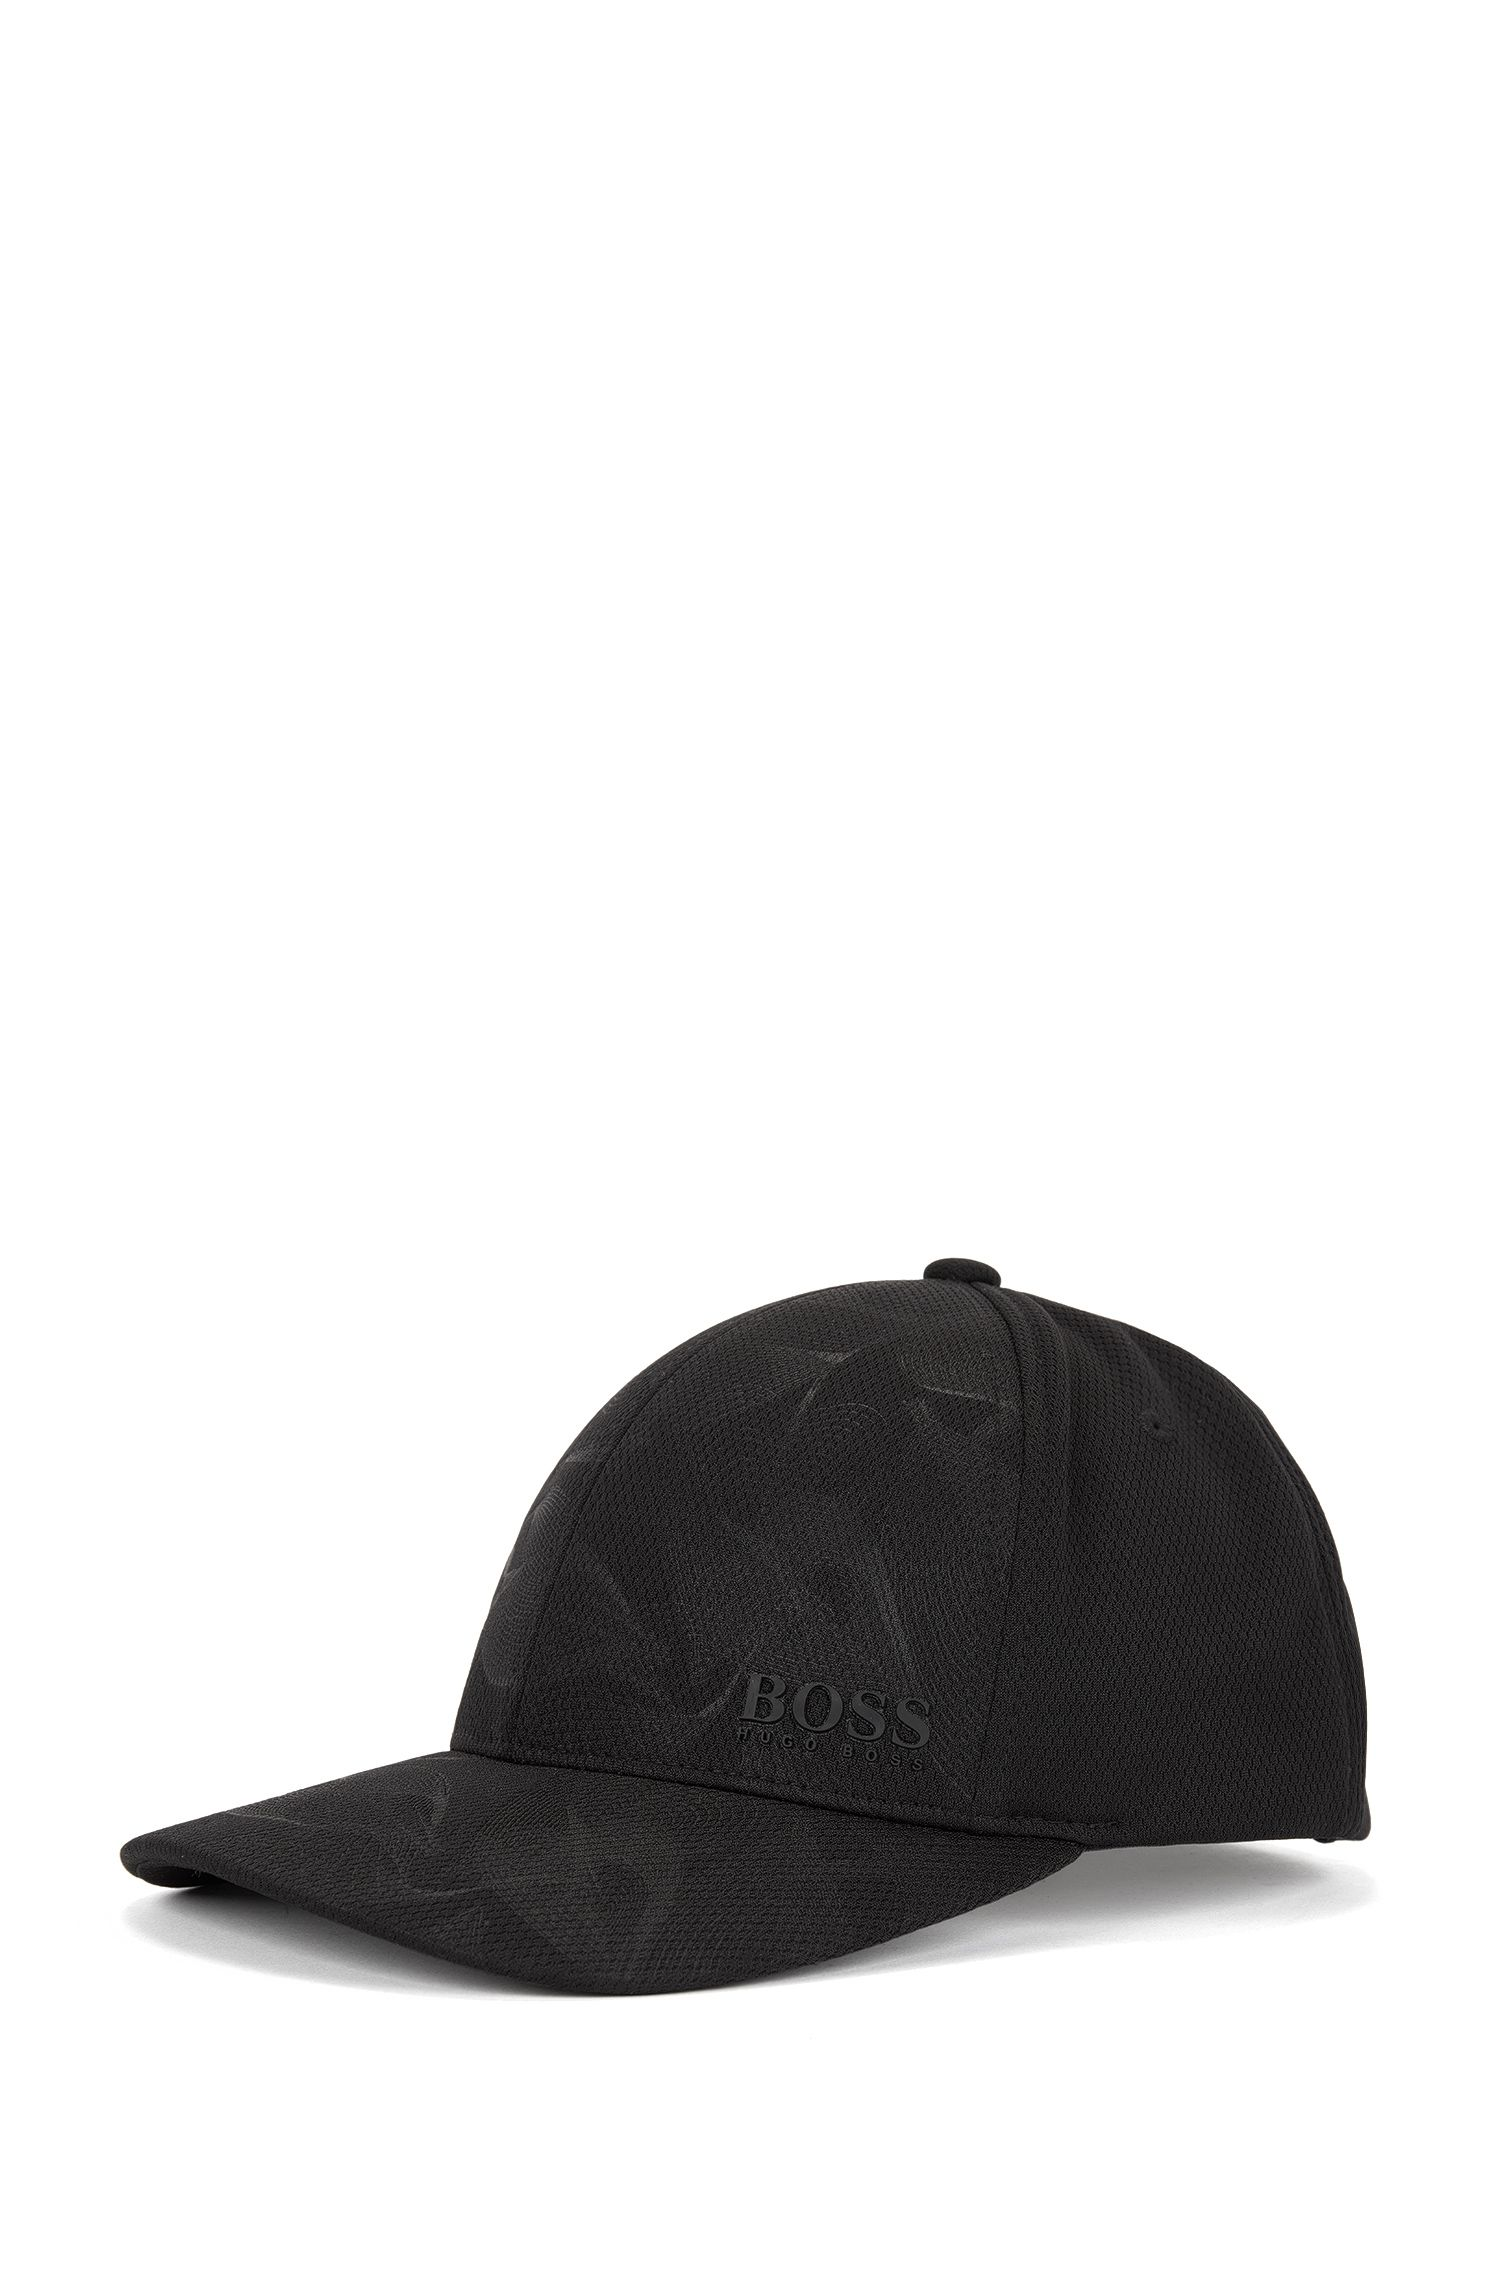 Printed Jersey Cap | Printcap